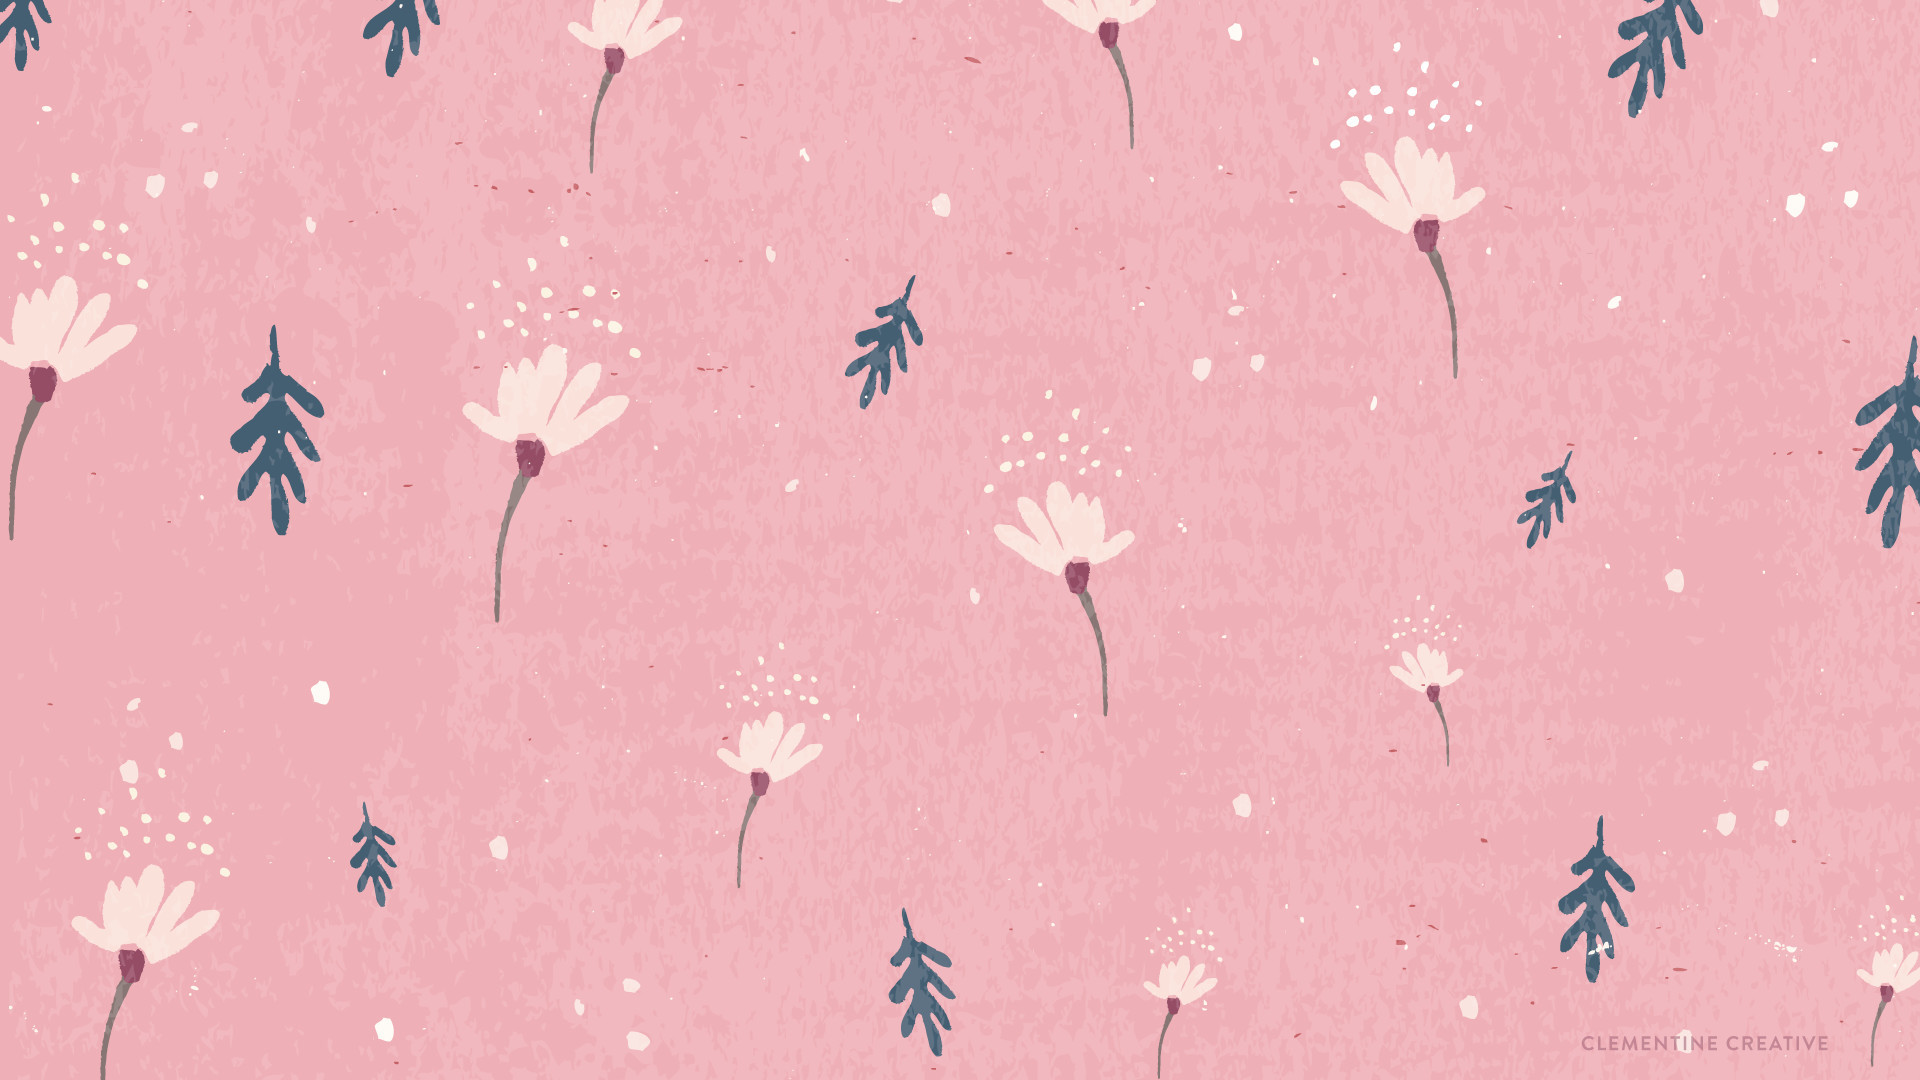 Pink Backgrounds for Desktop (68+ pictures)